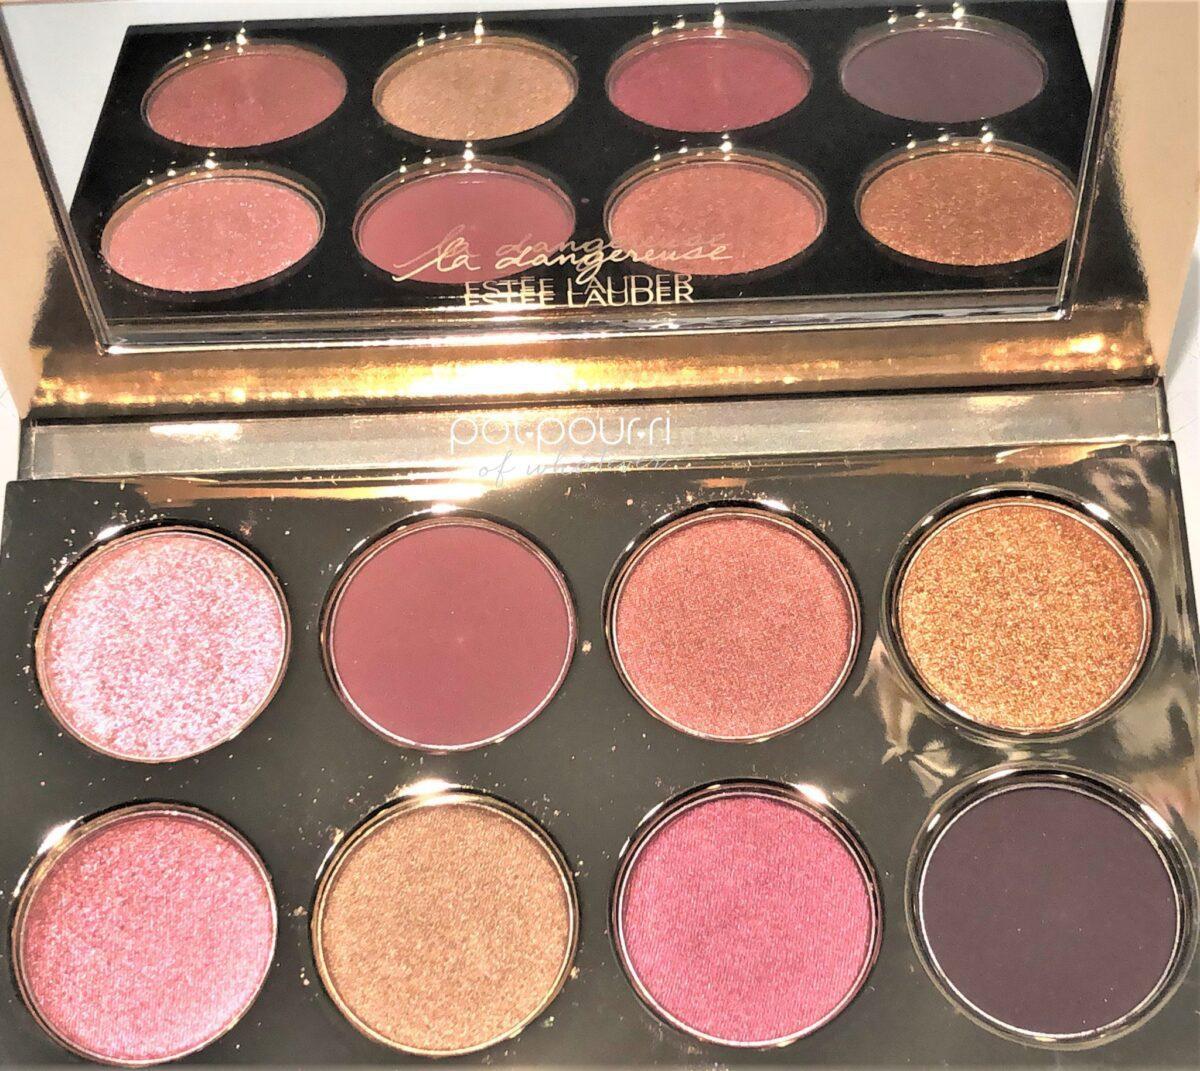 Estee Lauder X Violette Dangereuse Collection Amour Amour Eye Shadow Palette eight shadows, large mirror